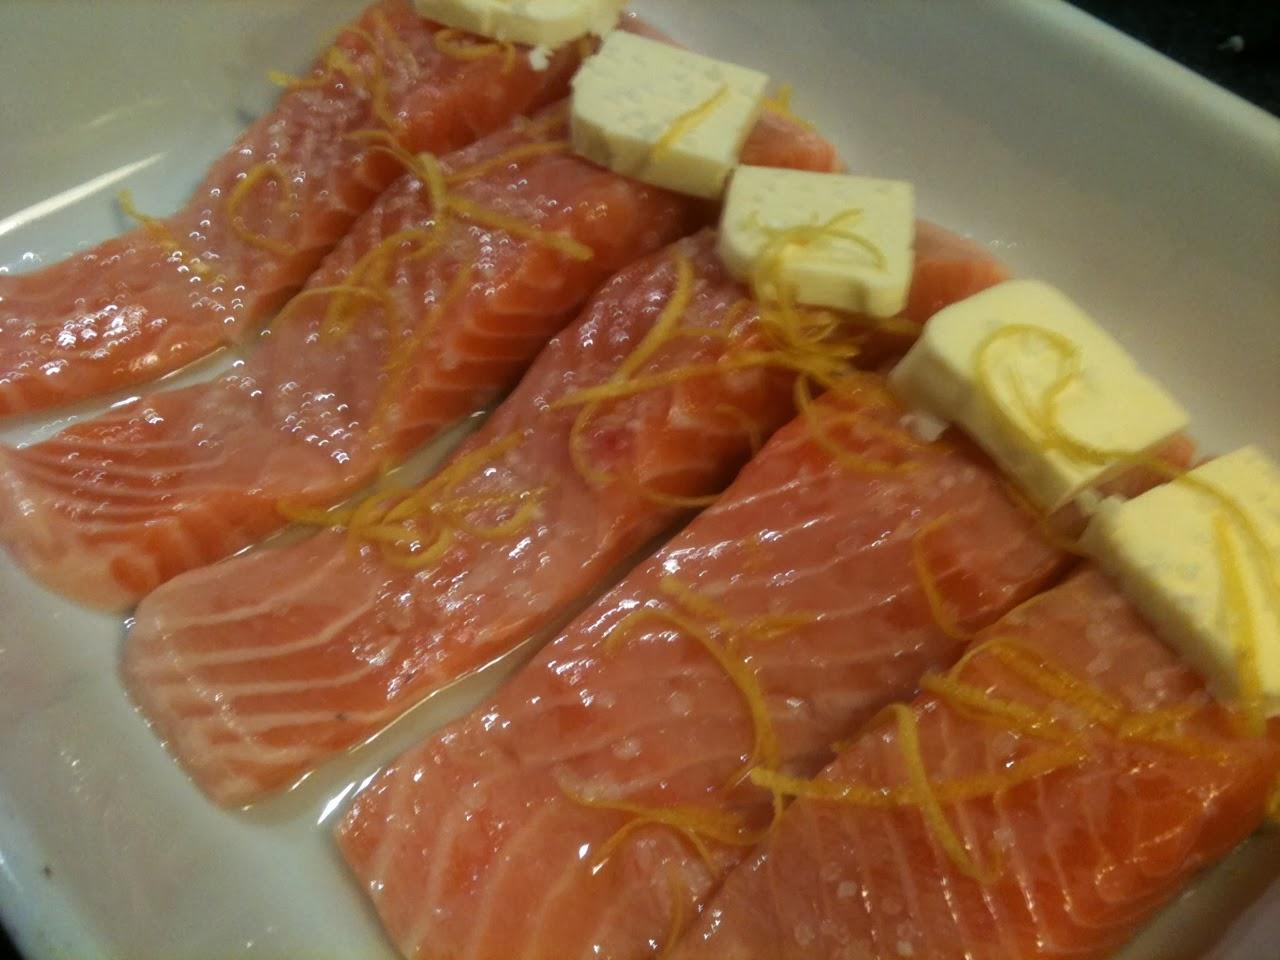 SablesMad: Laks m/citron & smør bagt i ovn